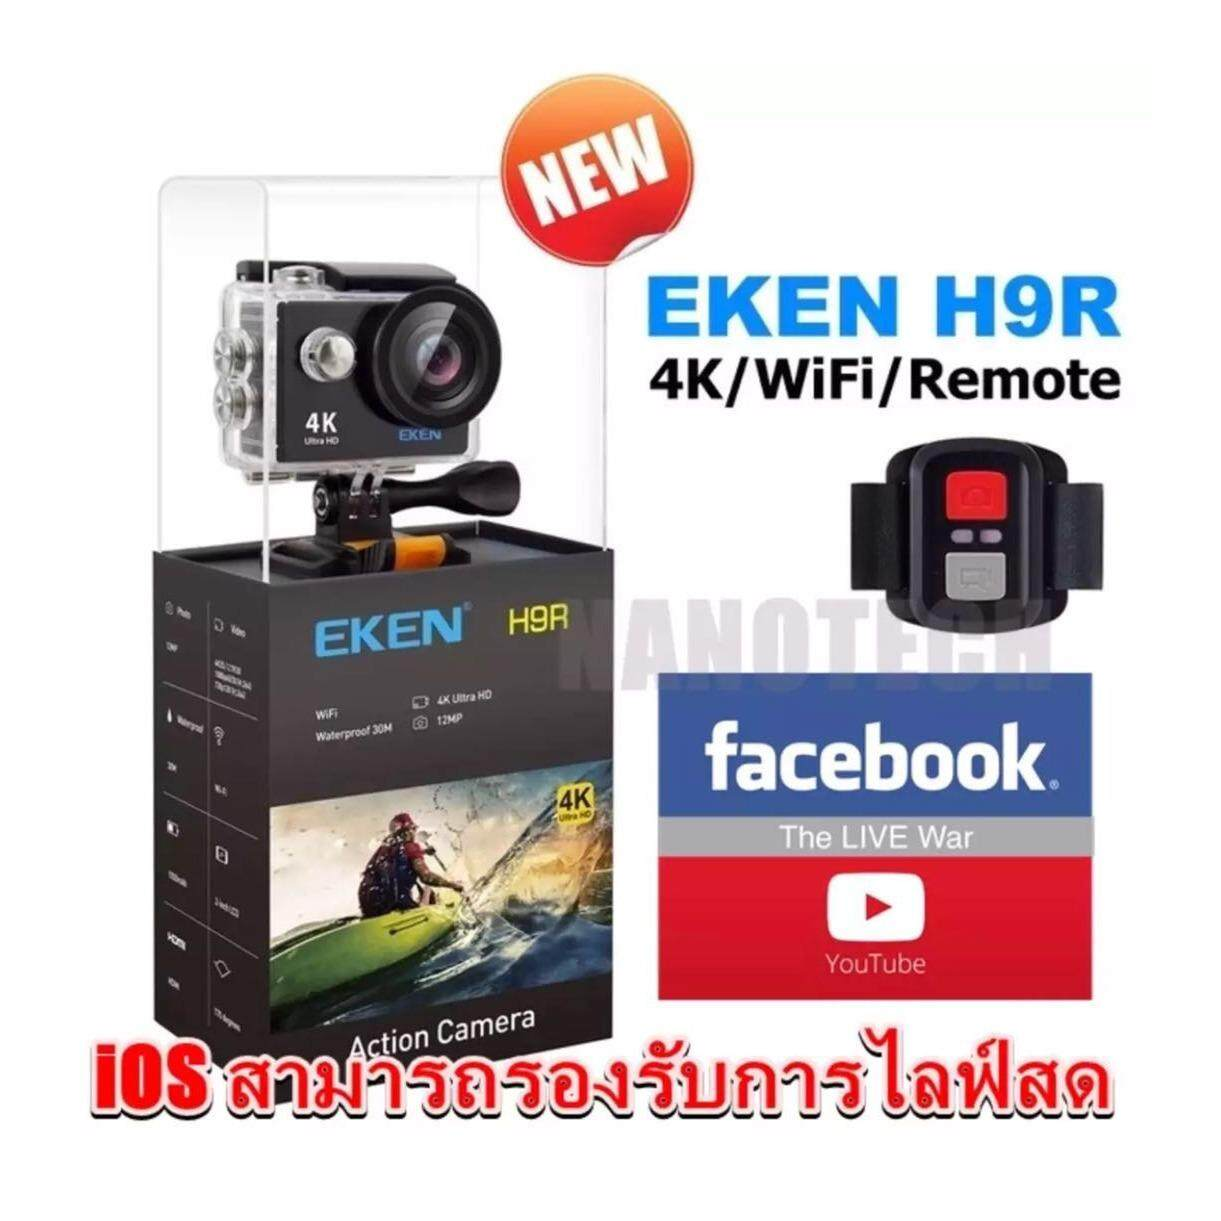 EKEN H9R แท้ กล้อง Action Camera 4K Ultra HD พร้อมรีโมท